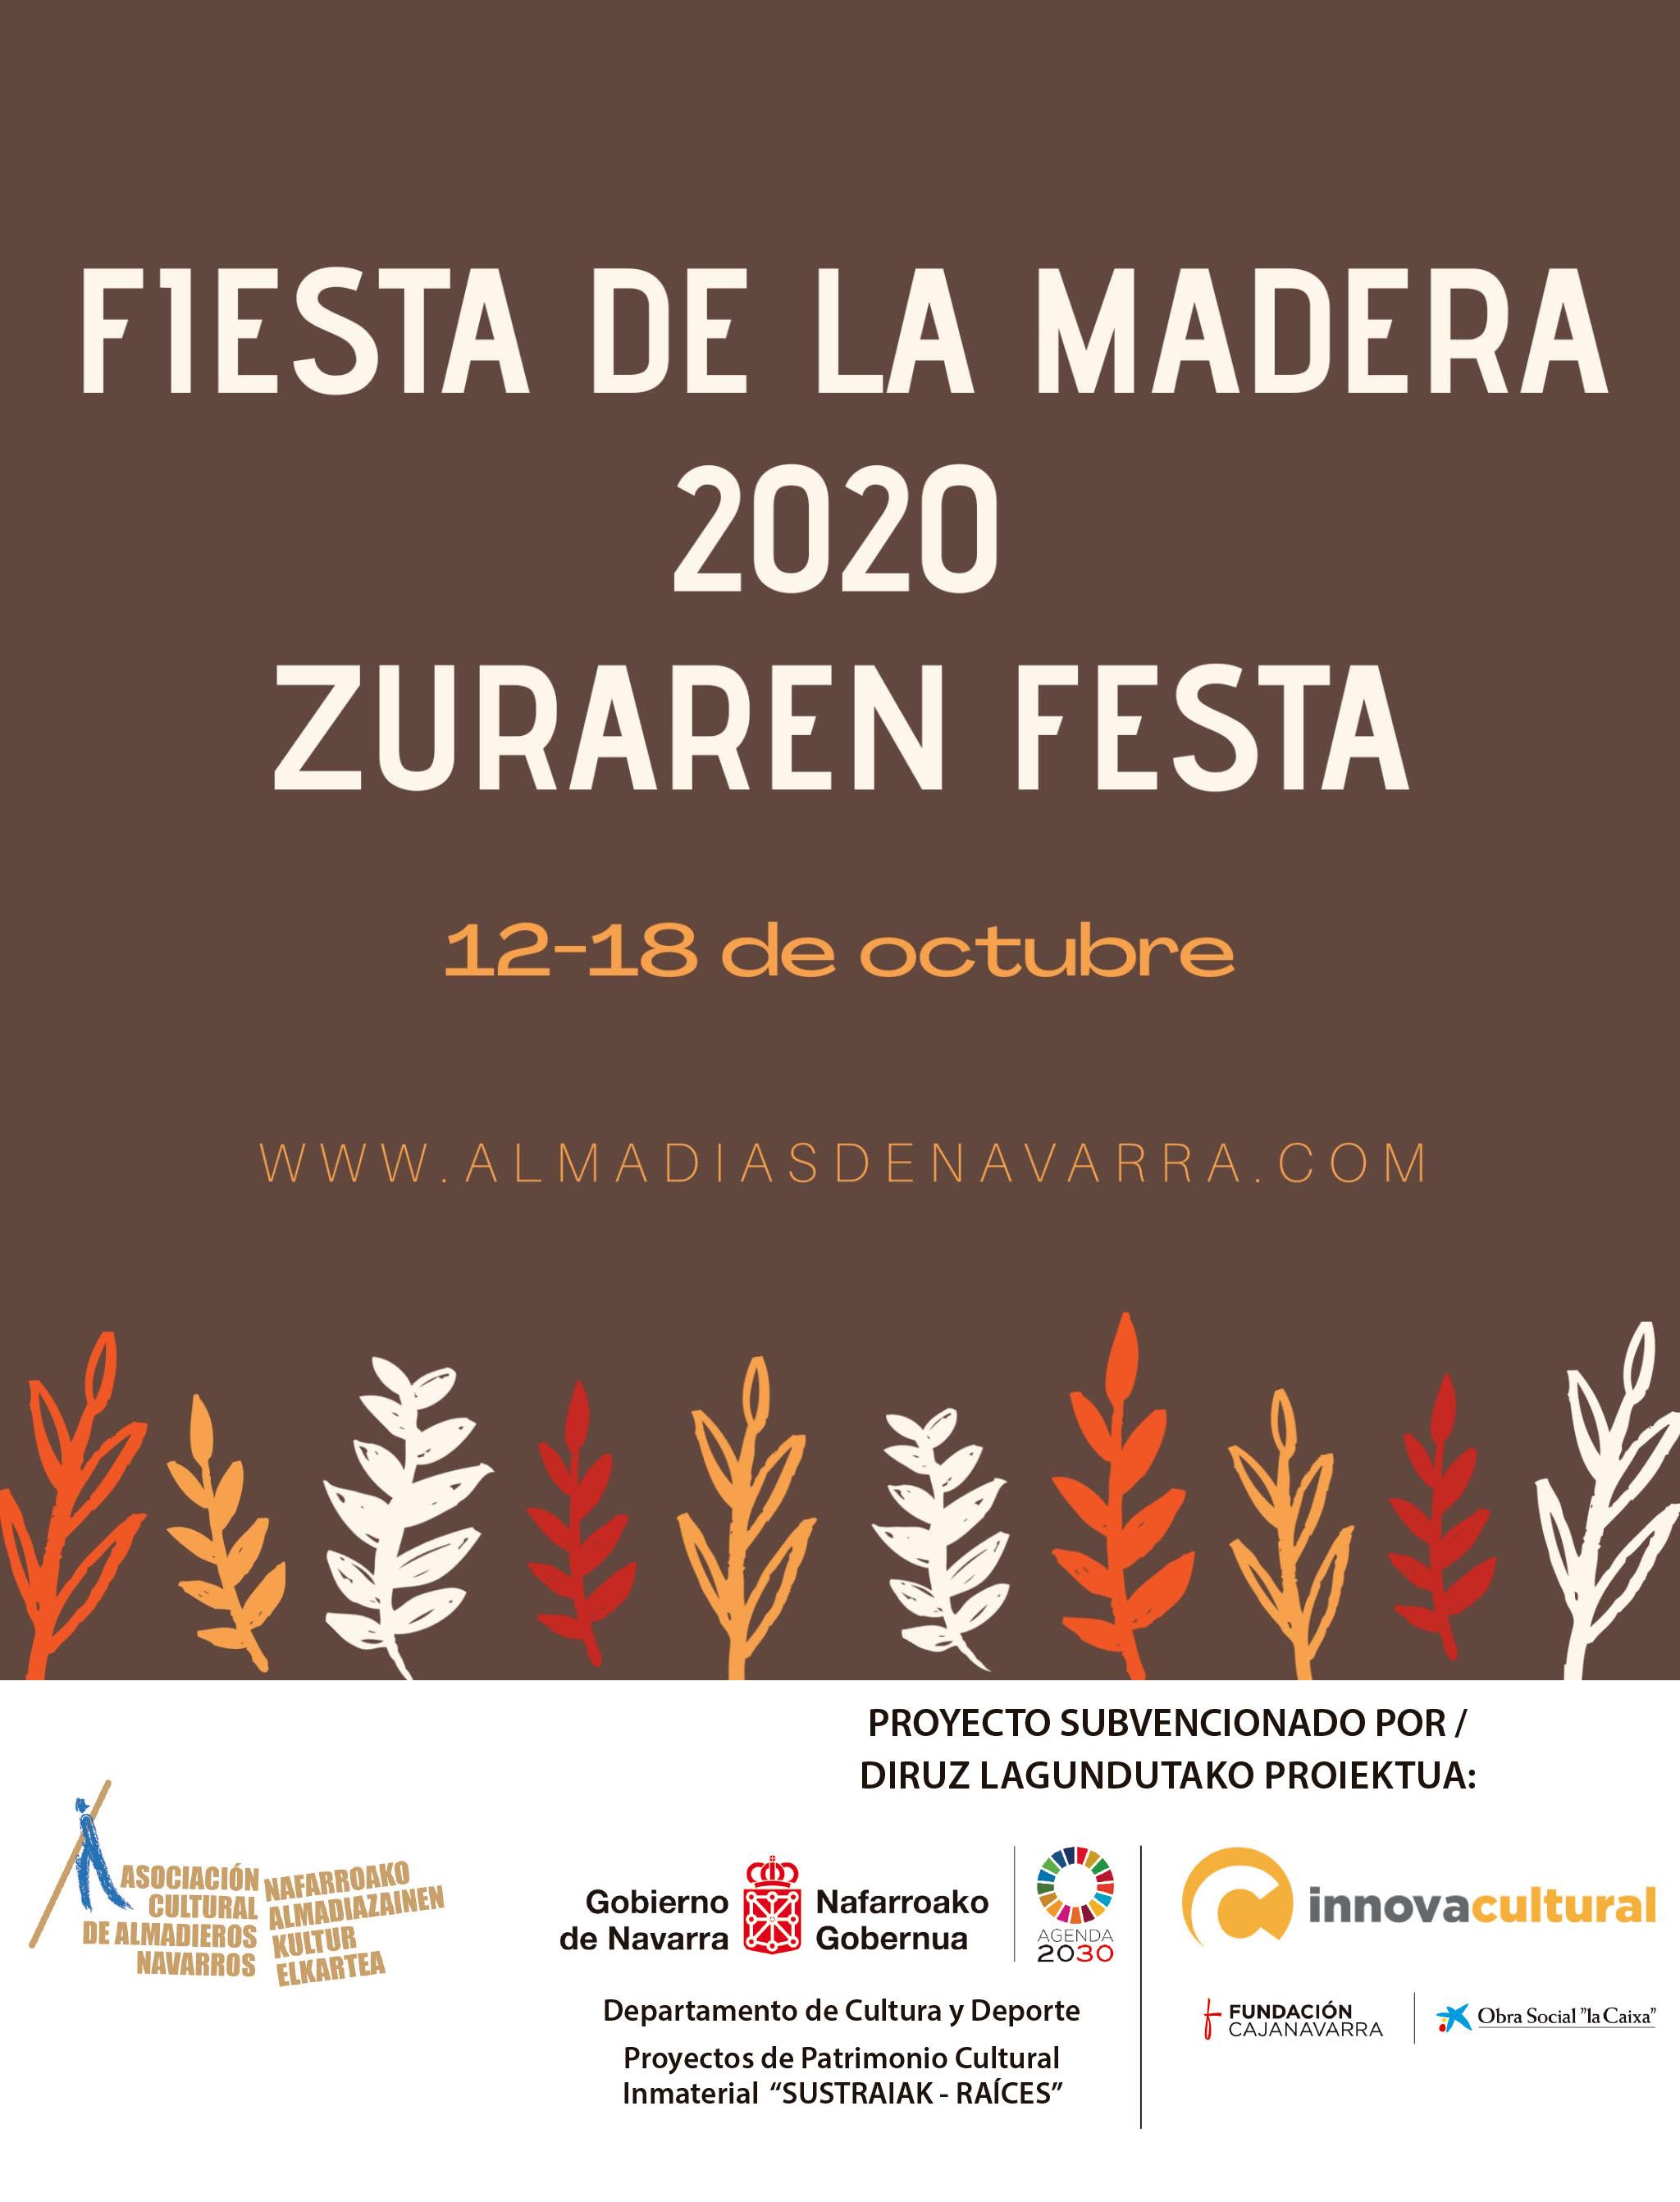 Fiesta de la madera 2020